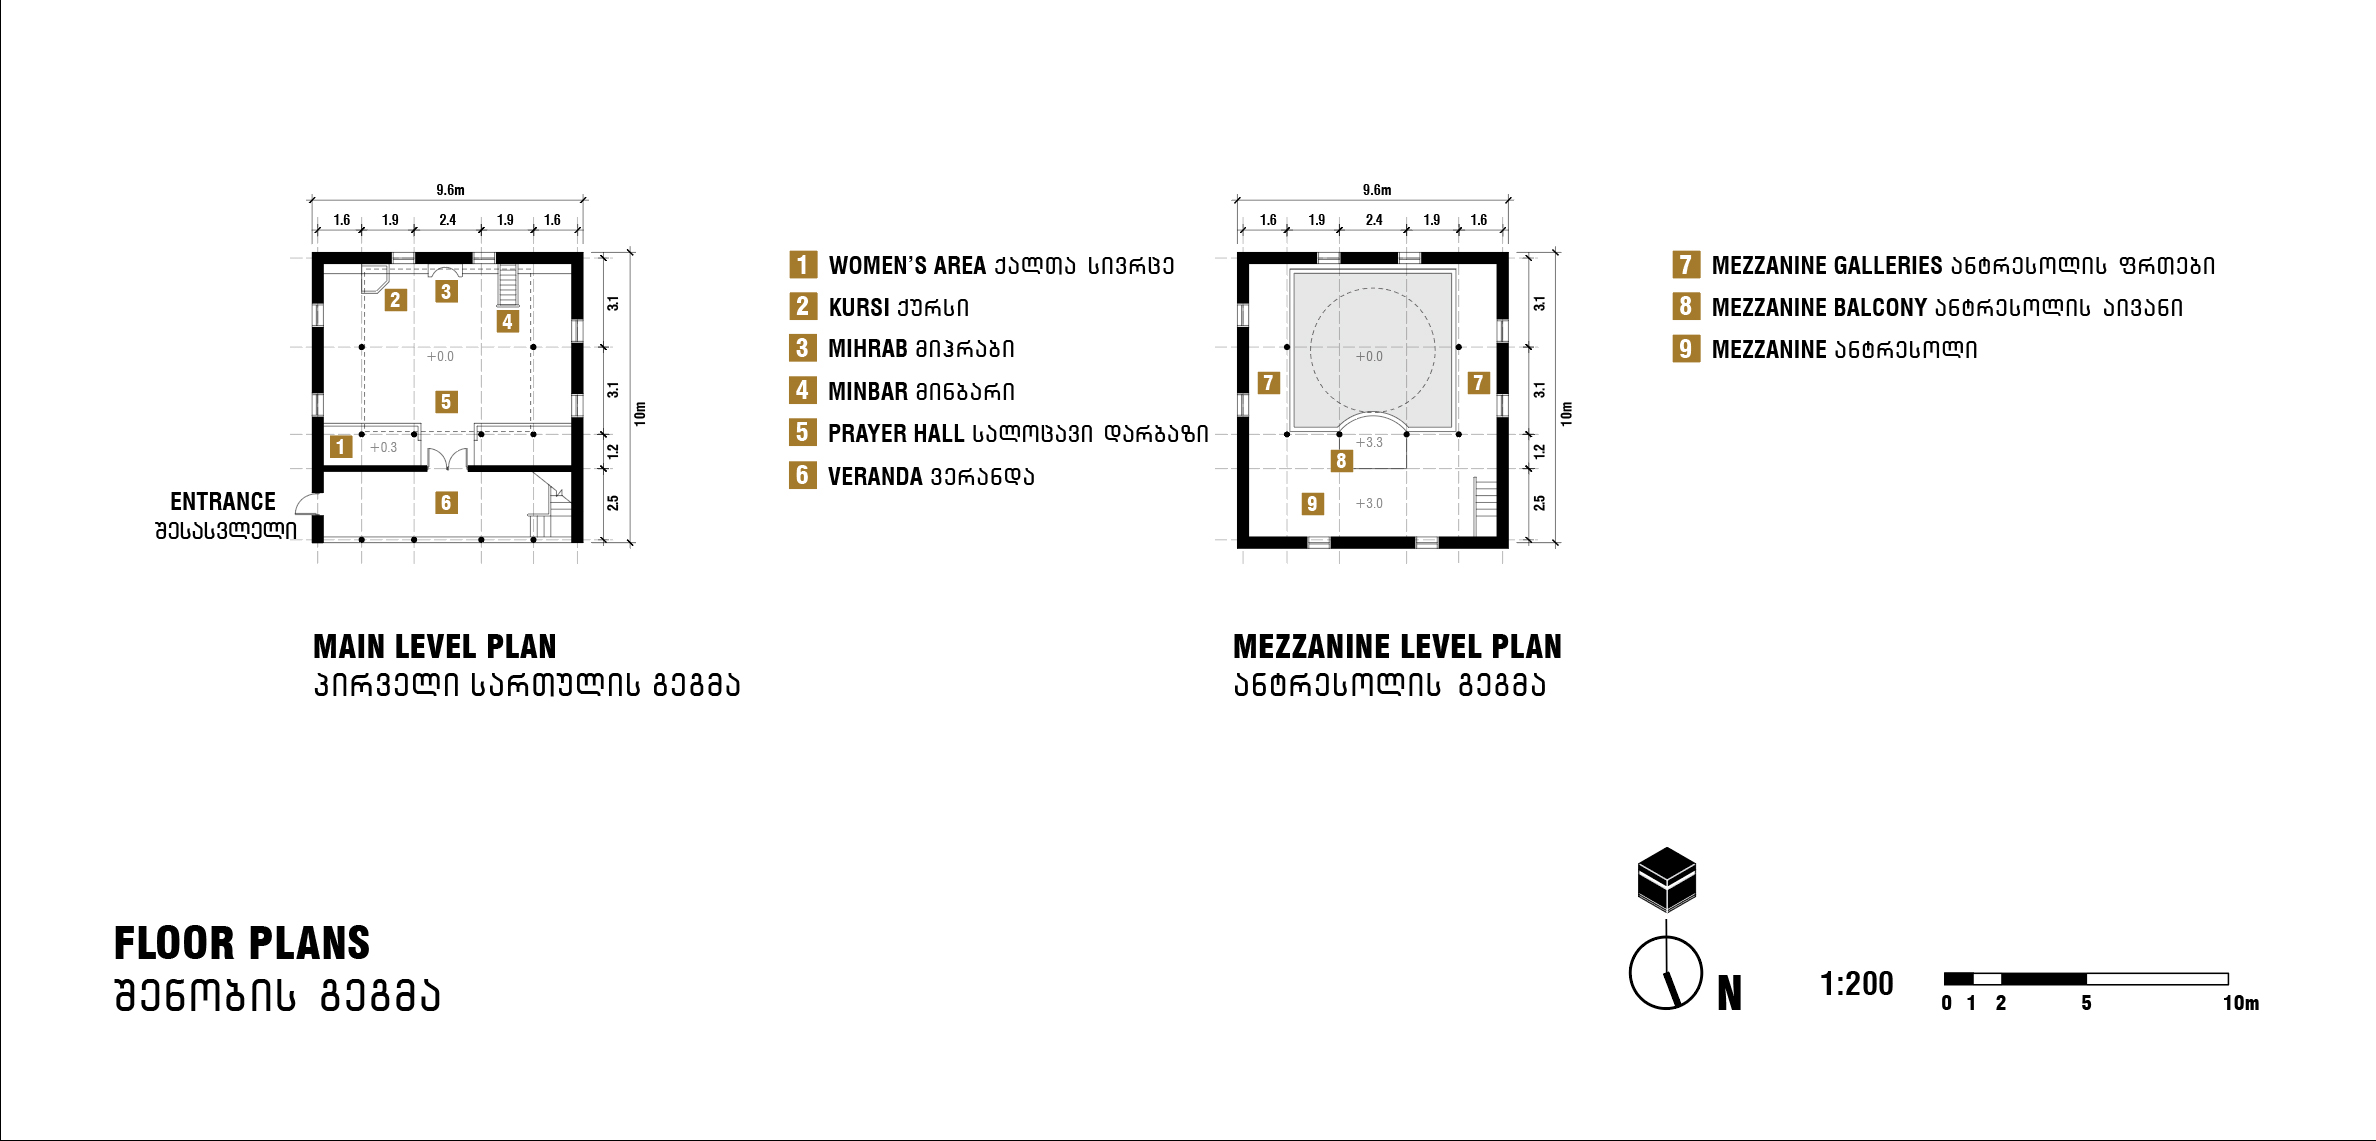 Dghvani_Floorplans.JPG